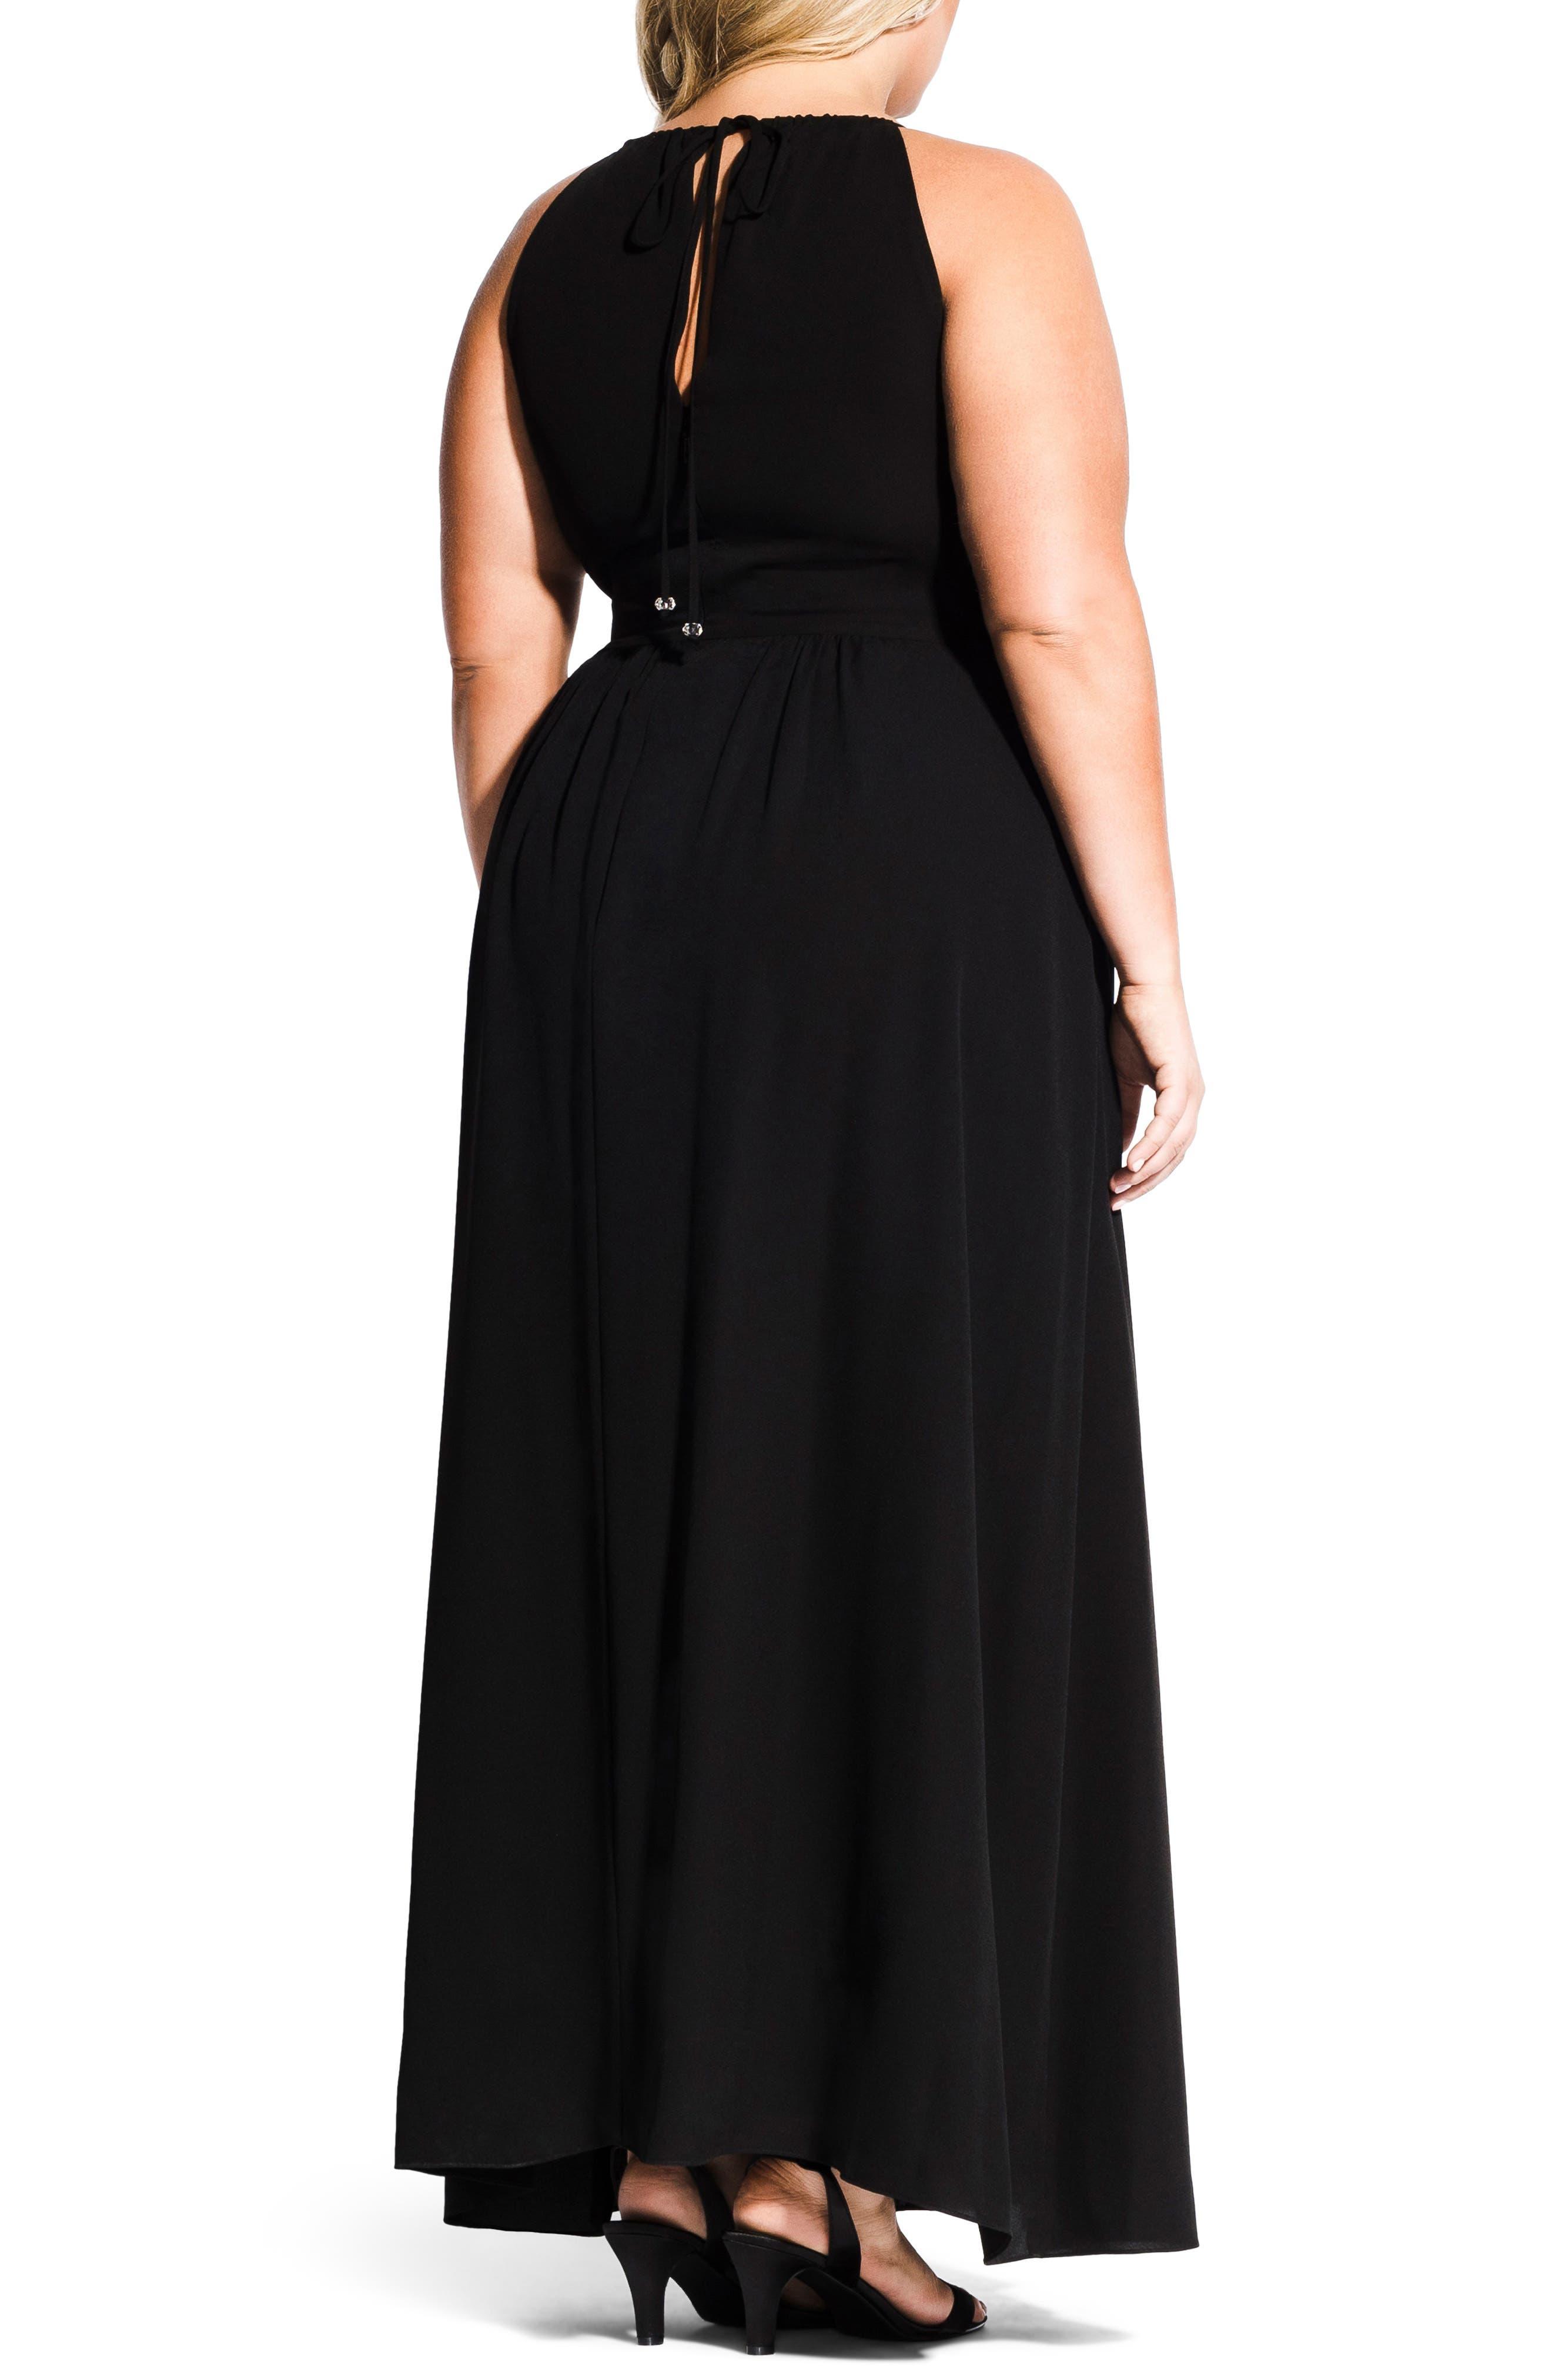 Devotion Maxi Dress,                             Alternate thumbnail 2, color,                             BLACK